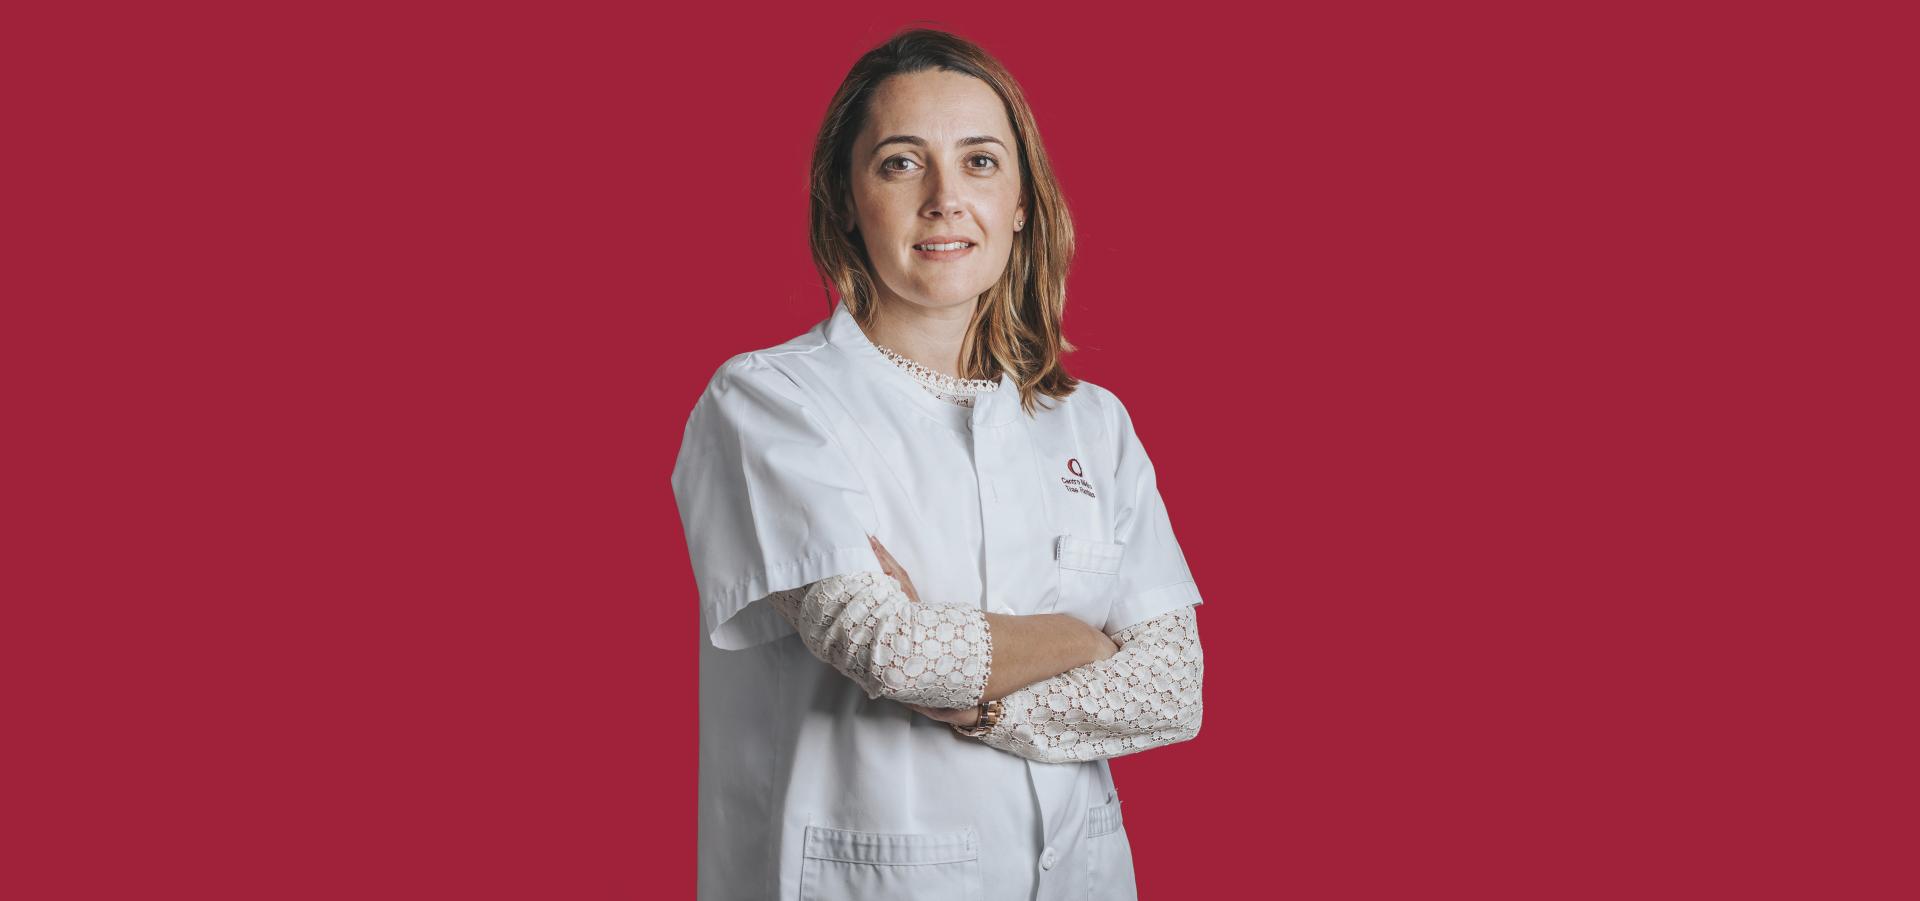 Dra. Cristina Pérez Matos